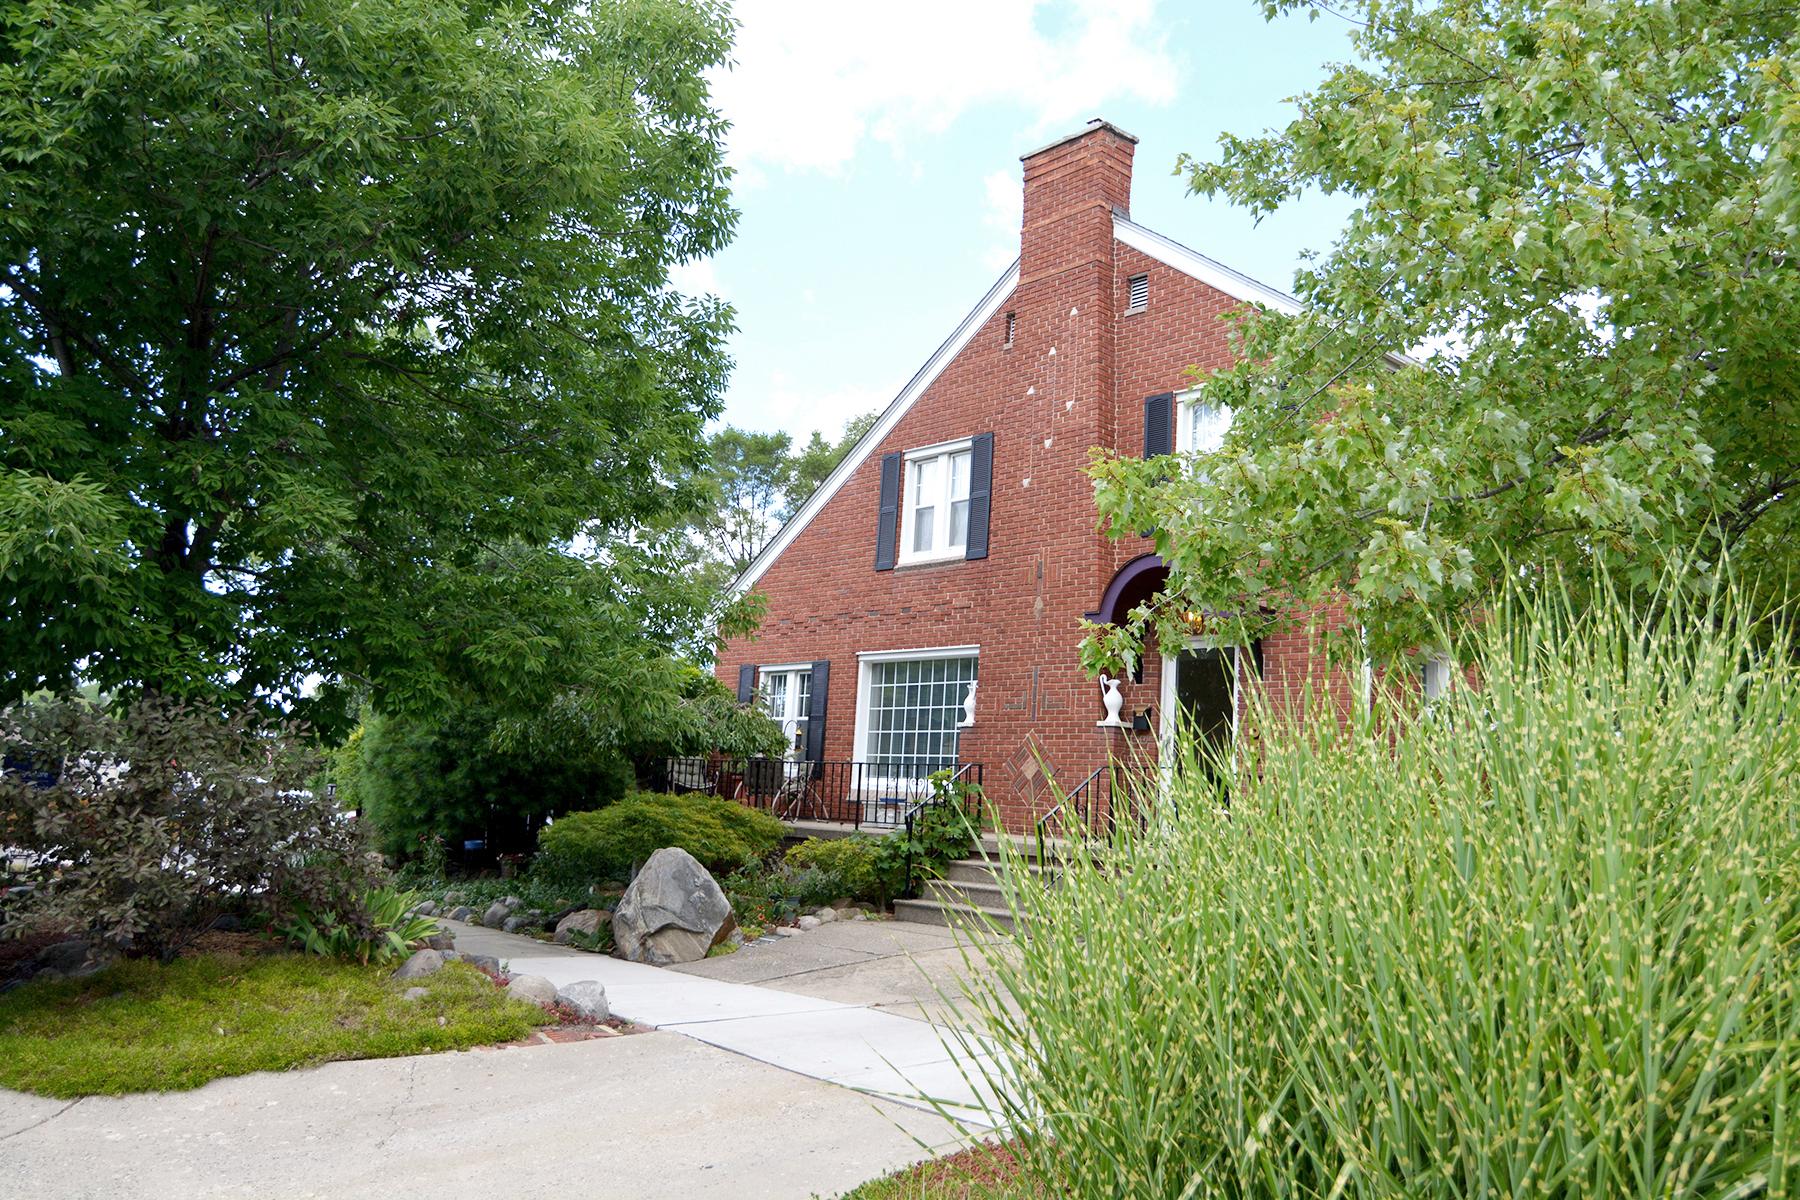 Single Family Home for Sale at Royal Oak 433 Cambridge Road Royal Oak, Michigan, 48067 United States